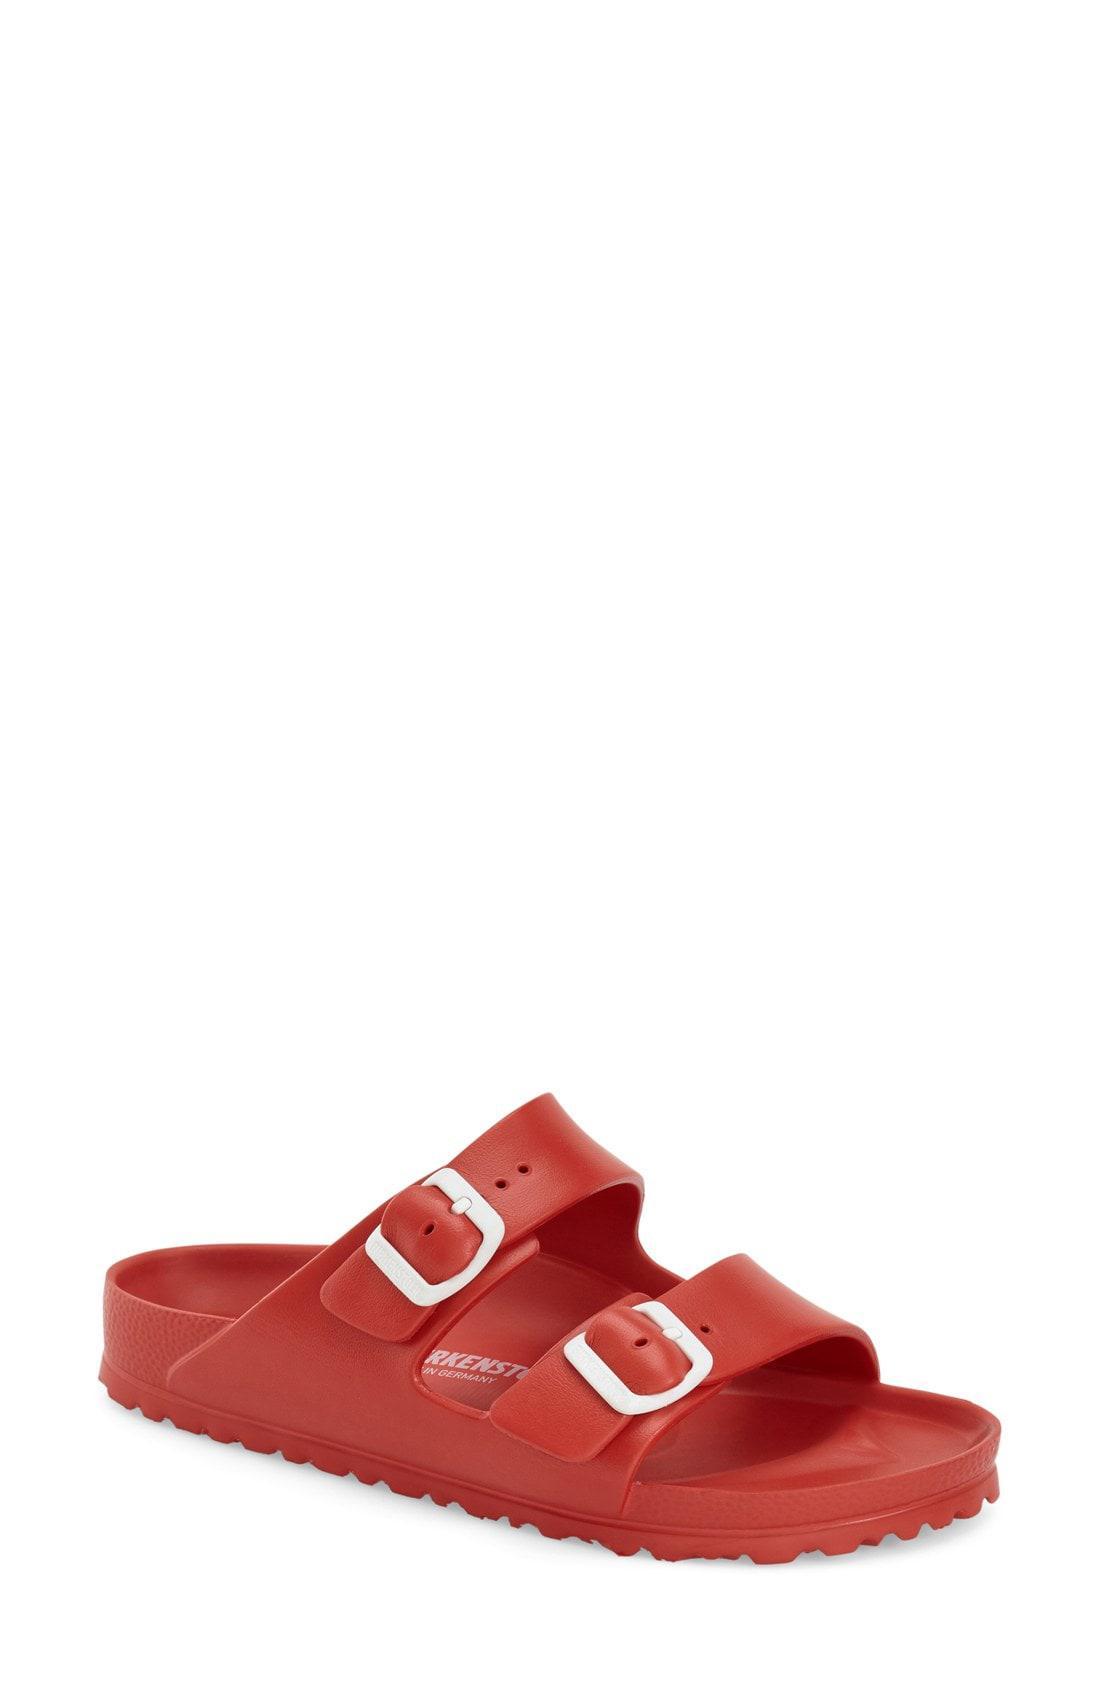 e1109b031 Birkenstock Essentials - Arizona Slide Sandal in Red - Lyst